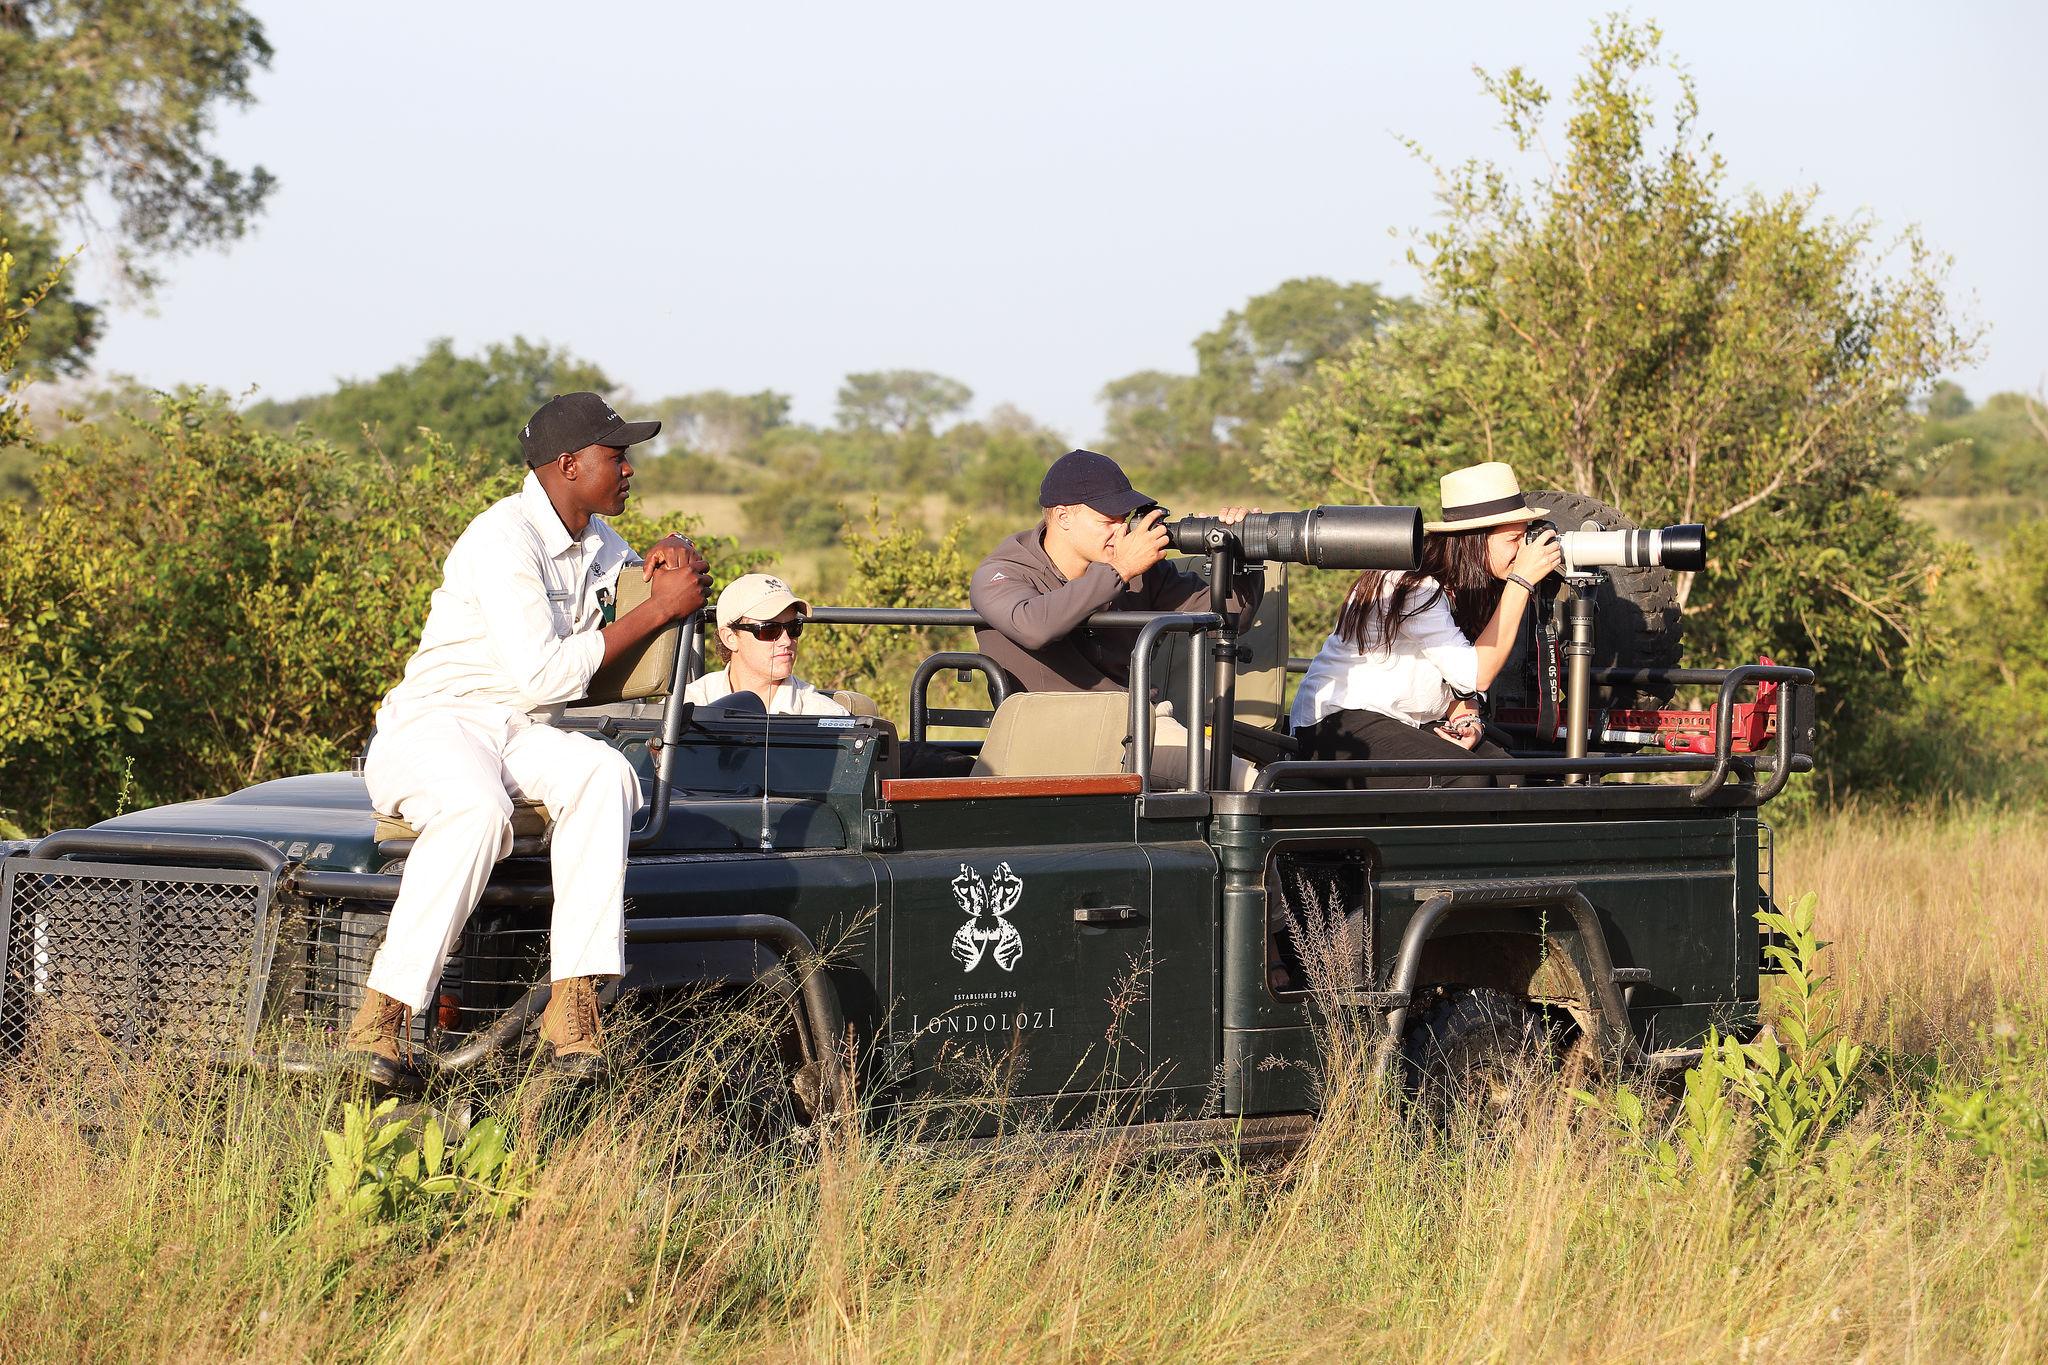 londolozi-activities-photographic-safari-04